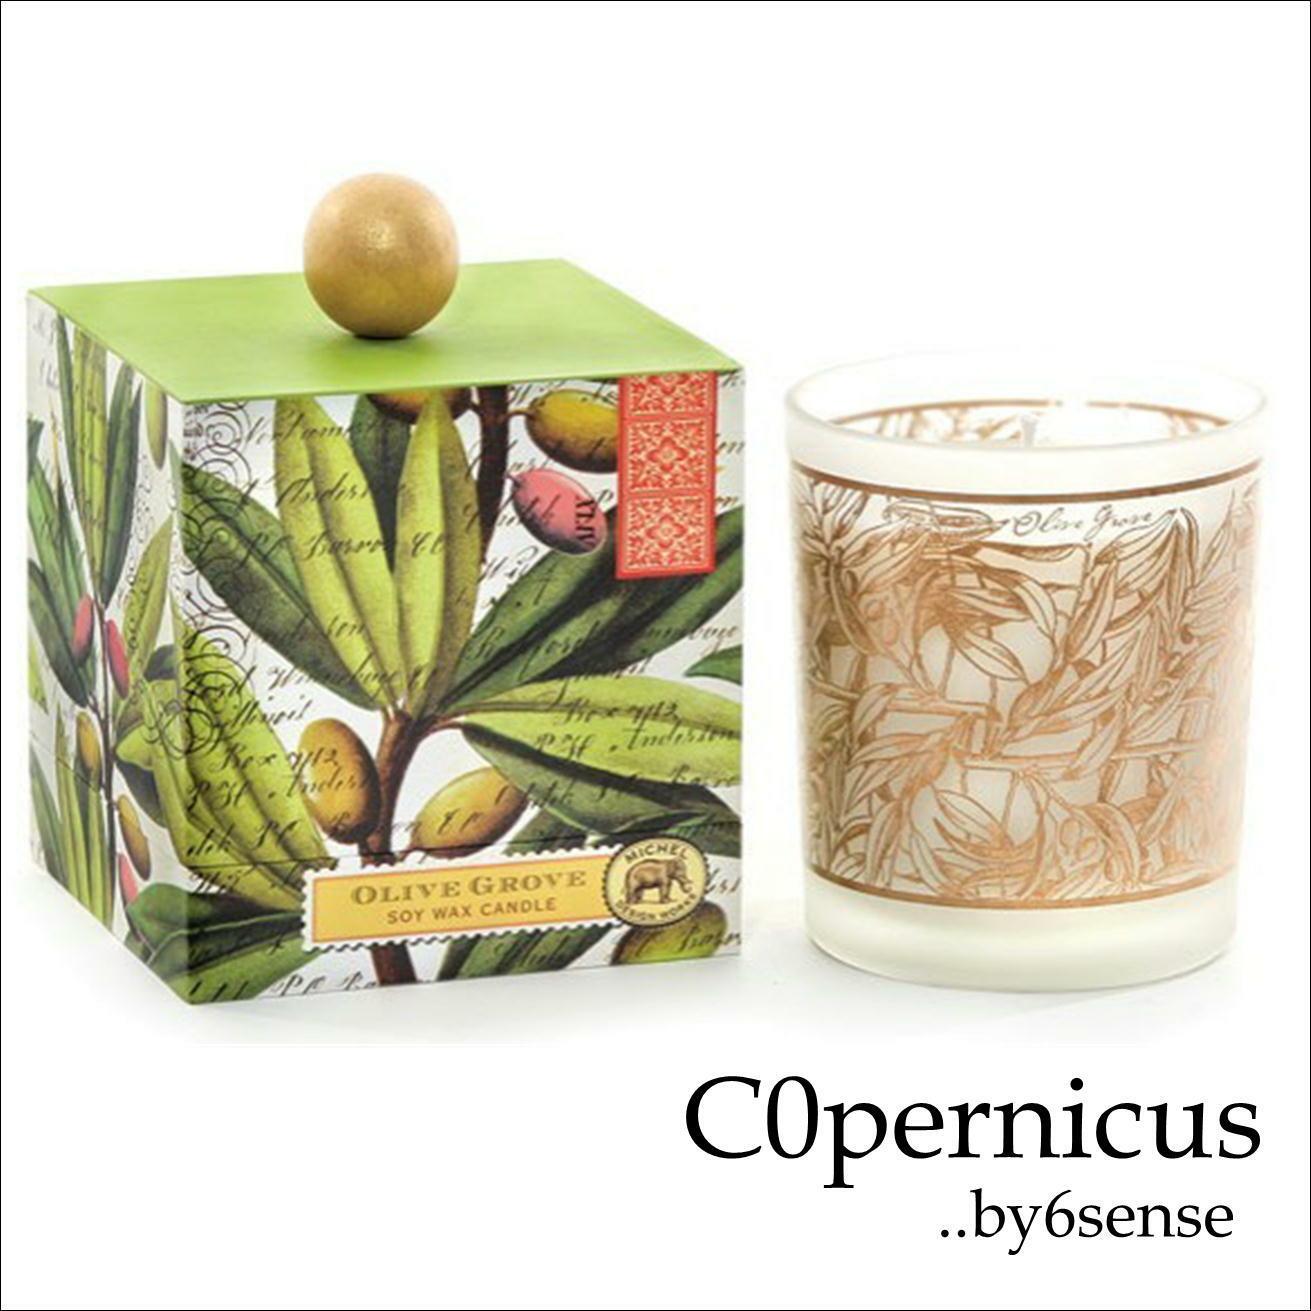 Oliveglove Michel Design Works アロマキャンドル ラージサイズ BOX付 ギフトにお勧め♪